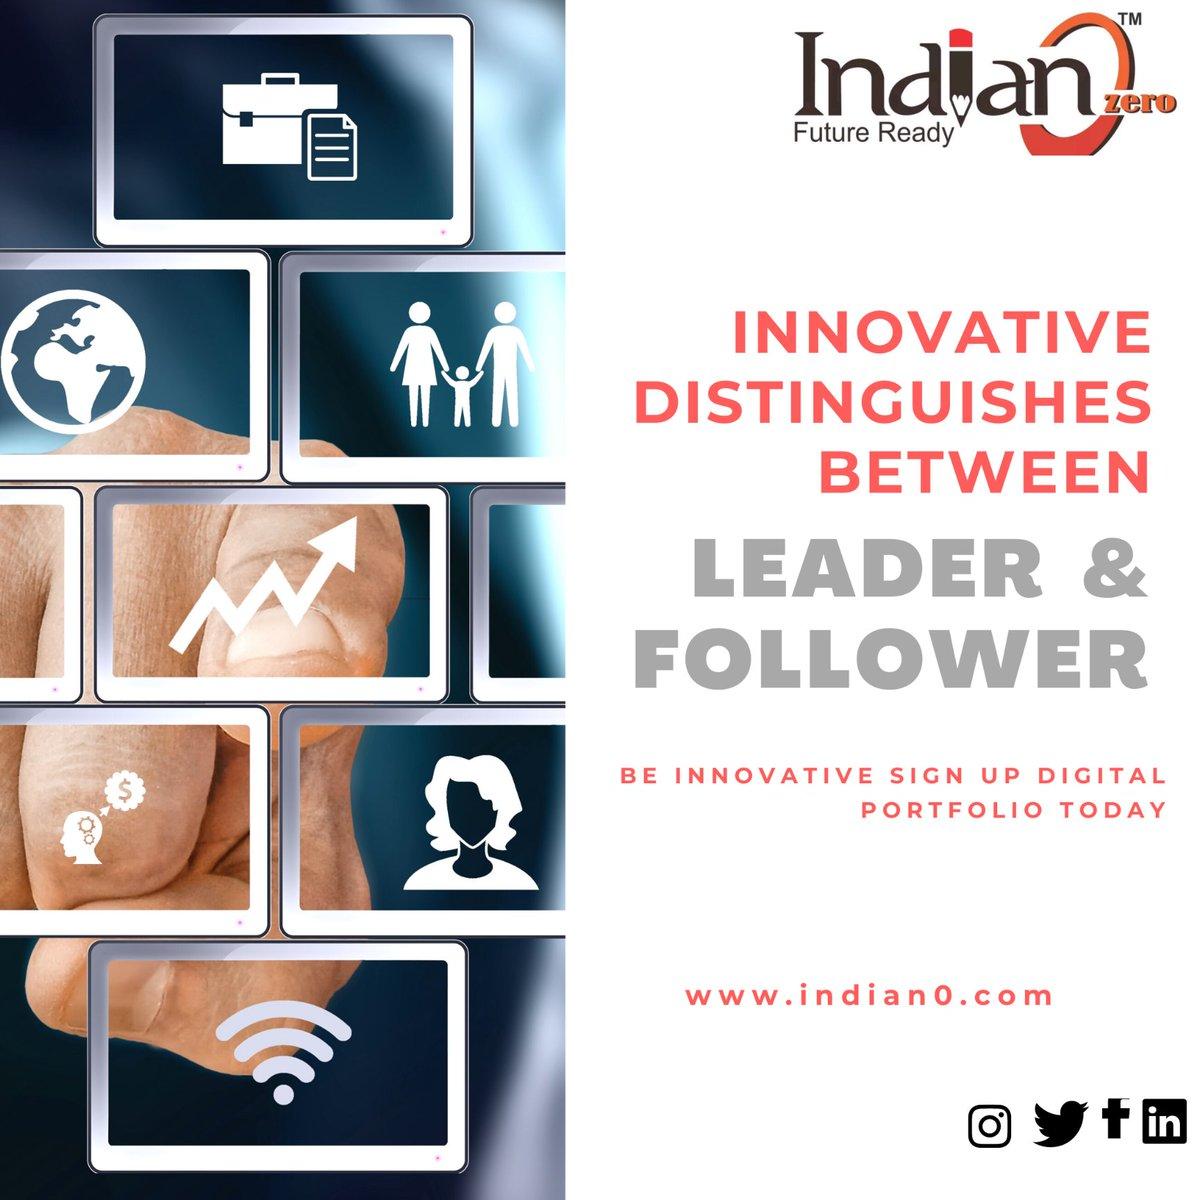 Be Innovative Sign up for Digital Portfolio Today.  Sign up for your Digital Portfolio https://t.co/l97MiBGZJ7 #VoiceofIndian0 #DigitalPortfolio #Indian0 I am game I am #FutureReady with #Indian0 @TheIndian0 https://t.co/UmoIJPfCLA